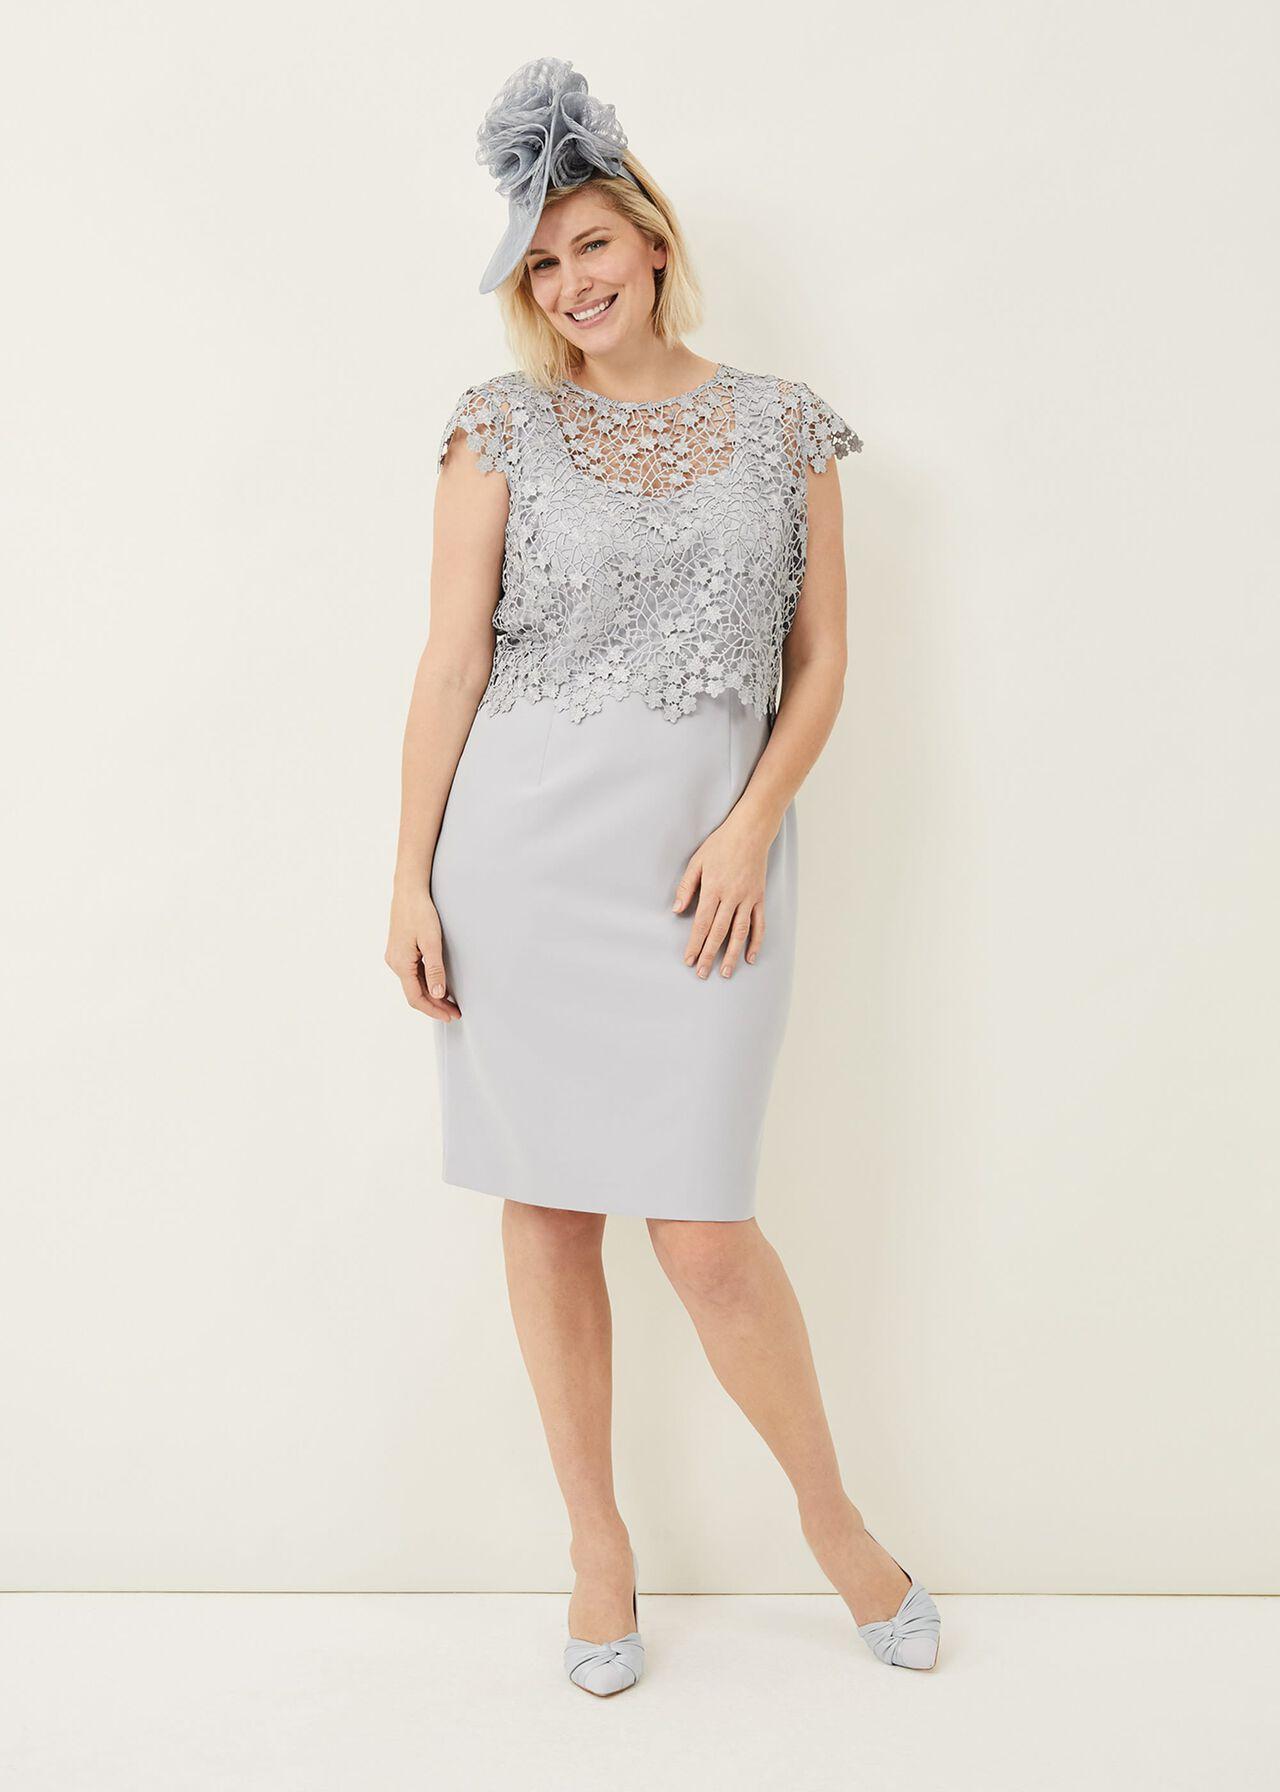 Mariposa Floral Lace Bodice Dress